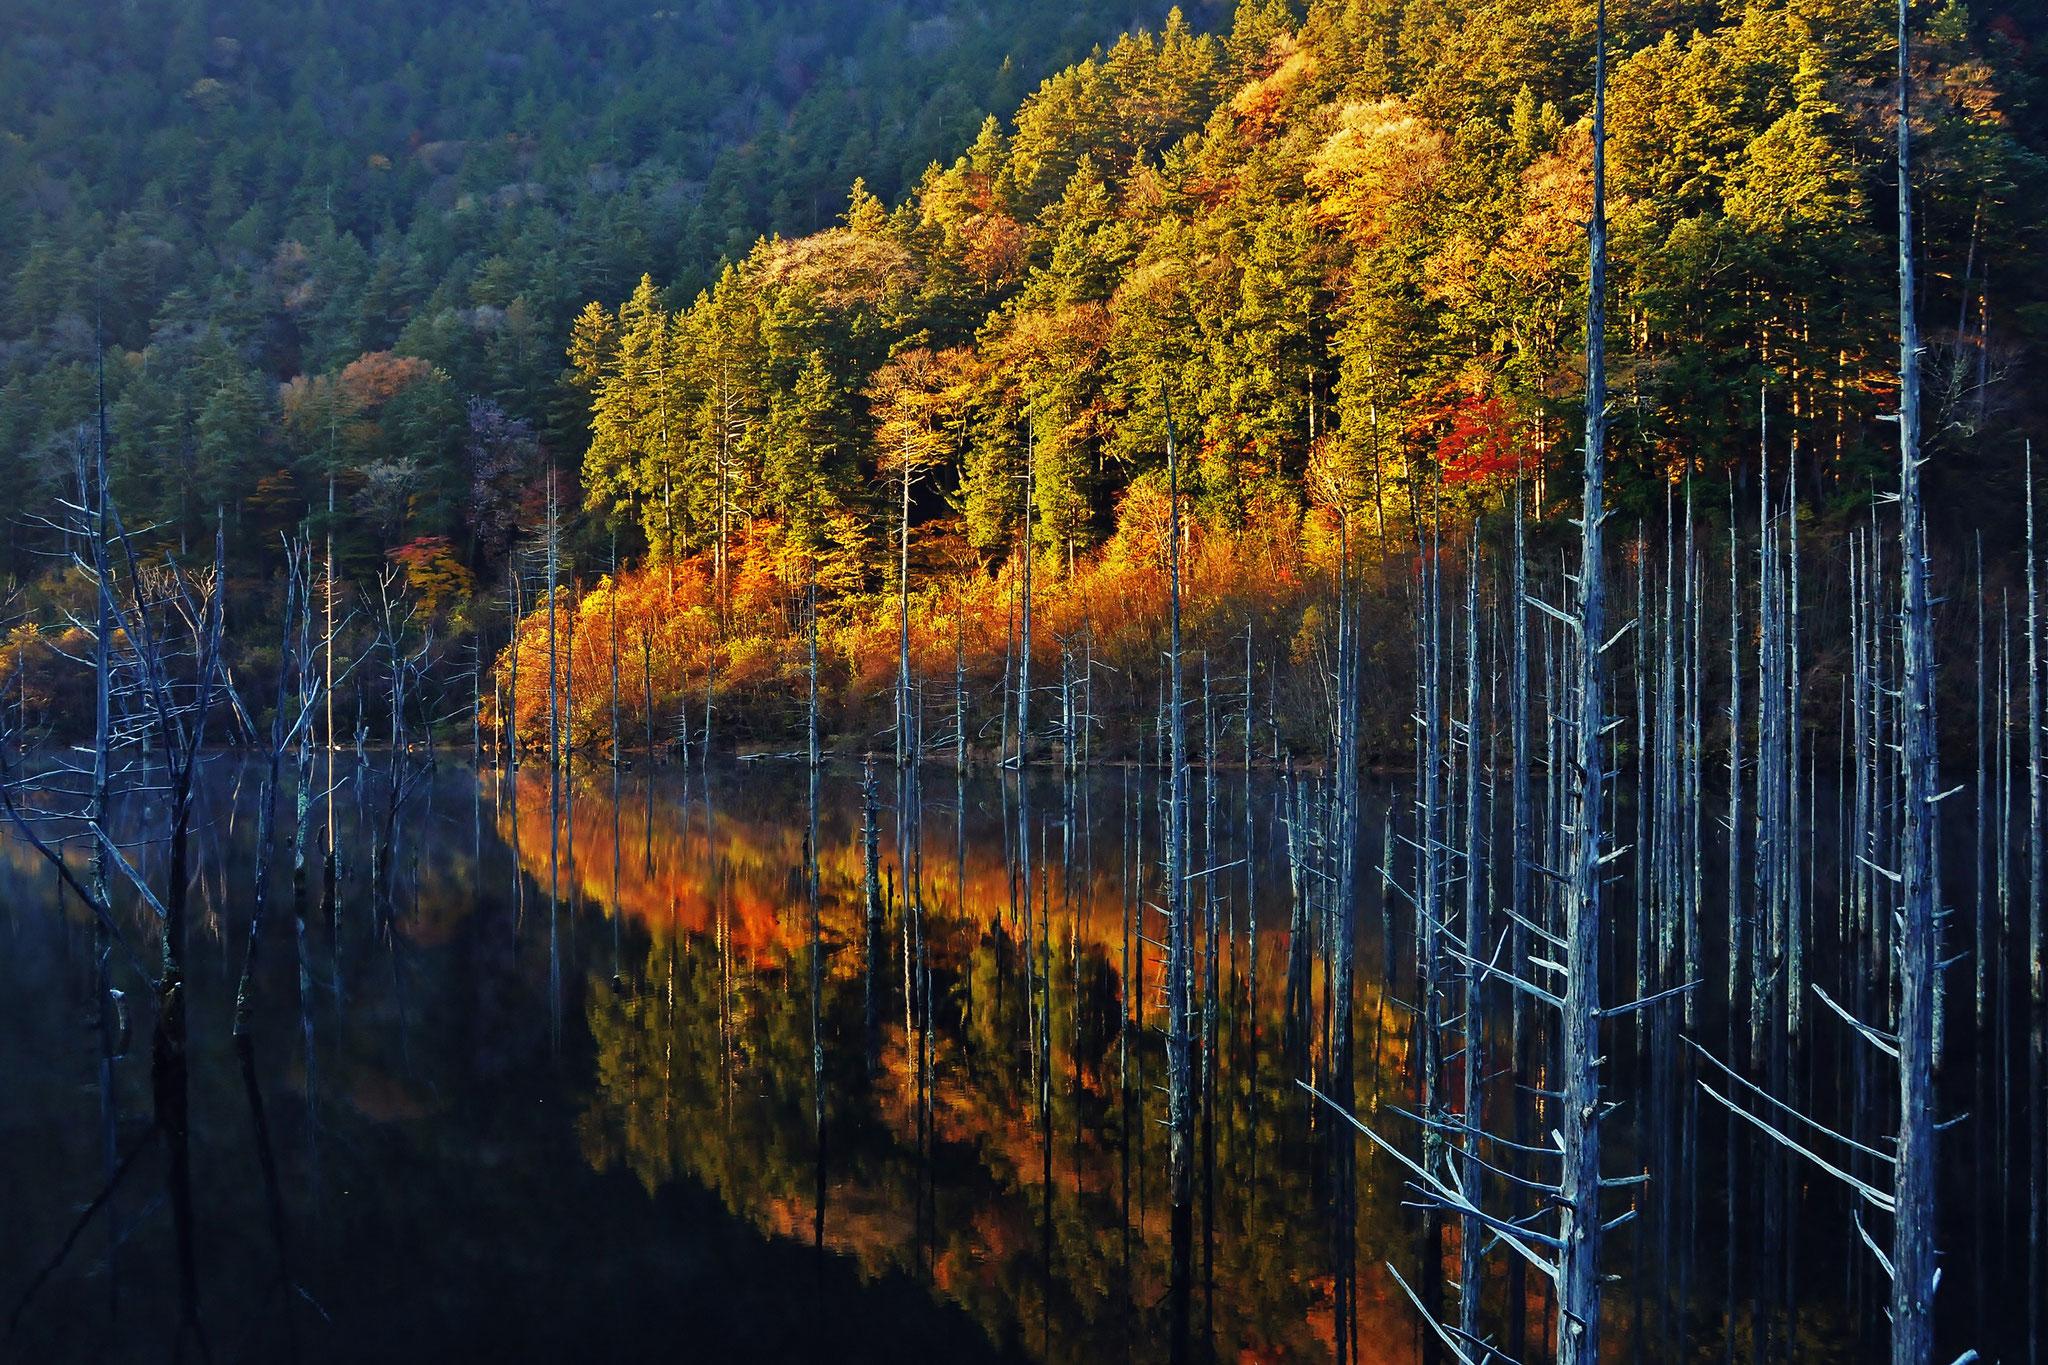 Kawano  Katsushige (japan) - Flowing colours of autumn